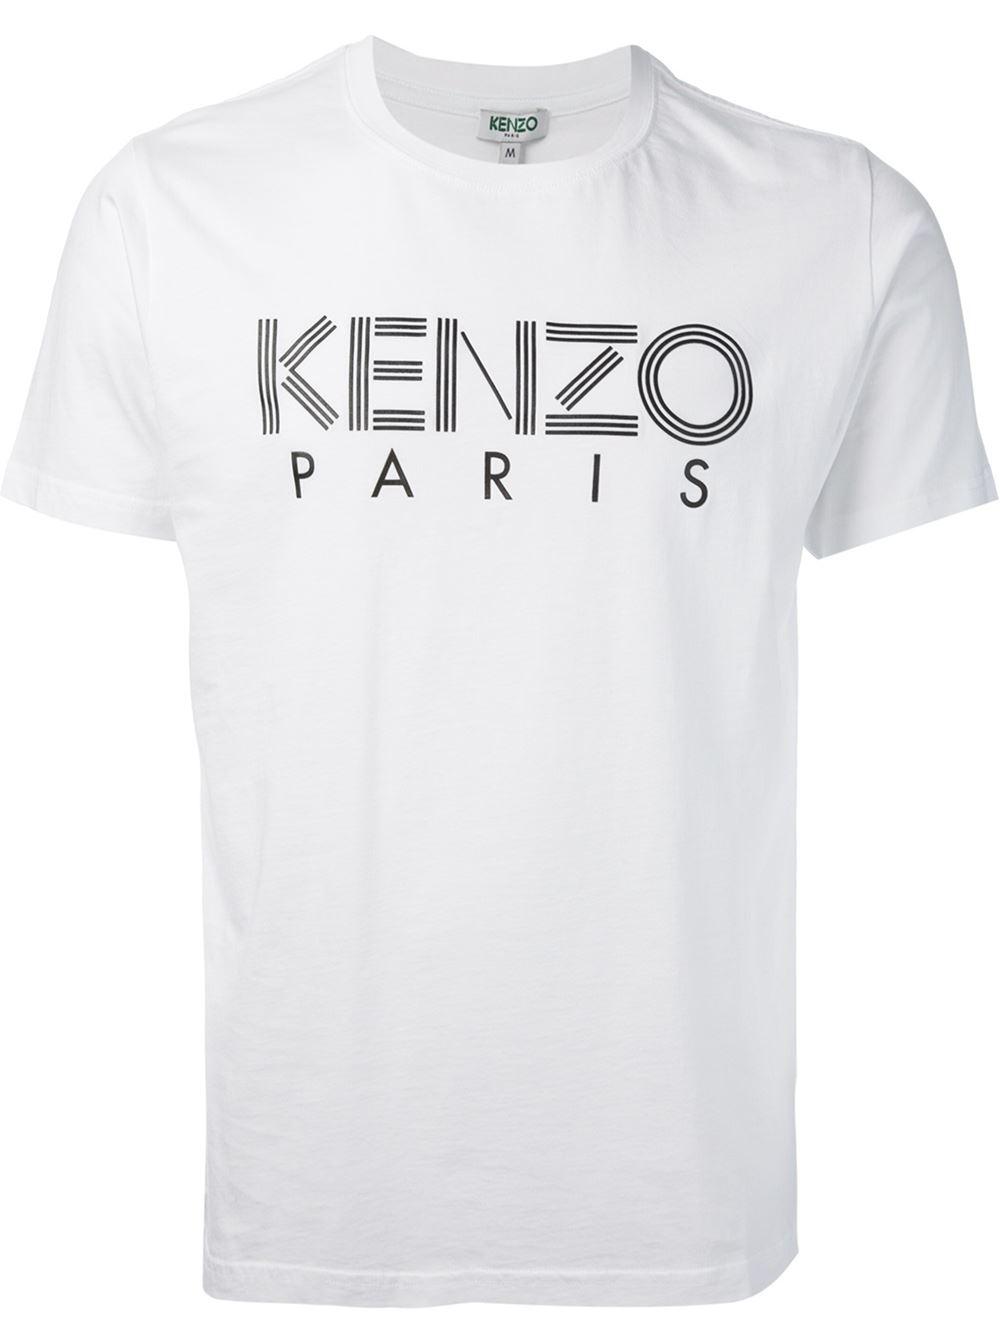 6daba3286688 KENZO ' Paris' T-Shirt in White for Men - Lyst